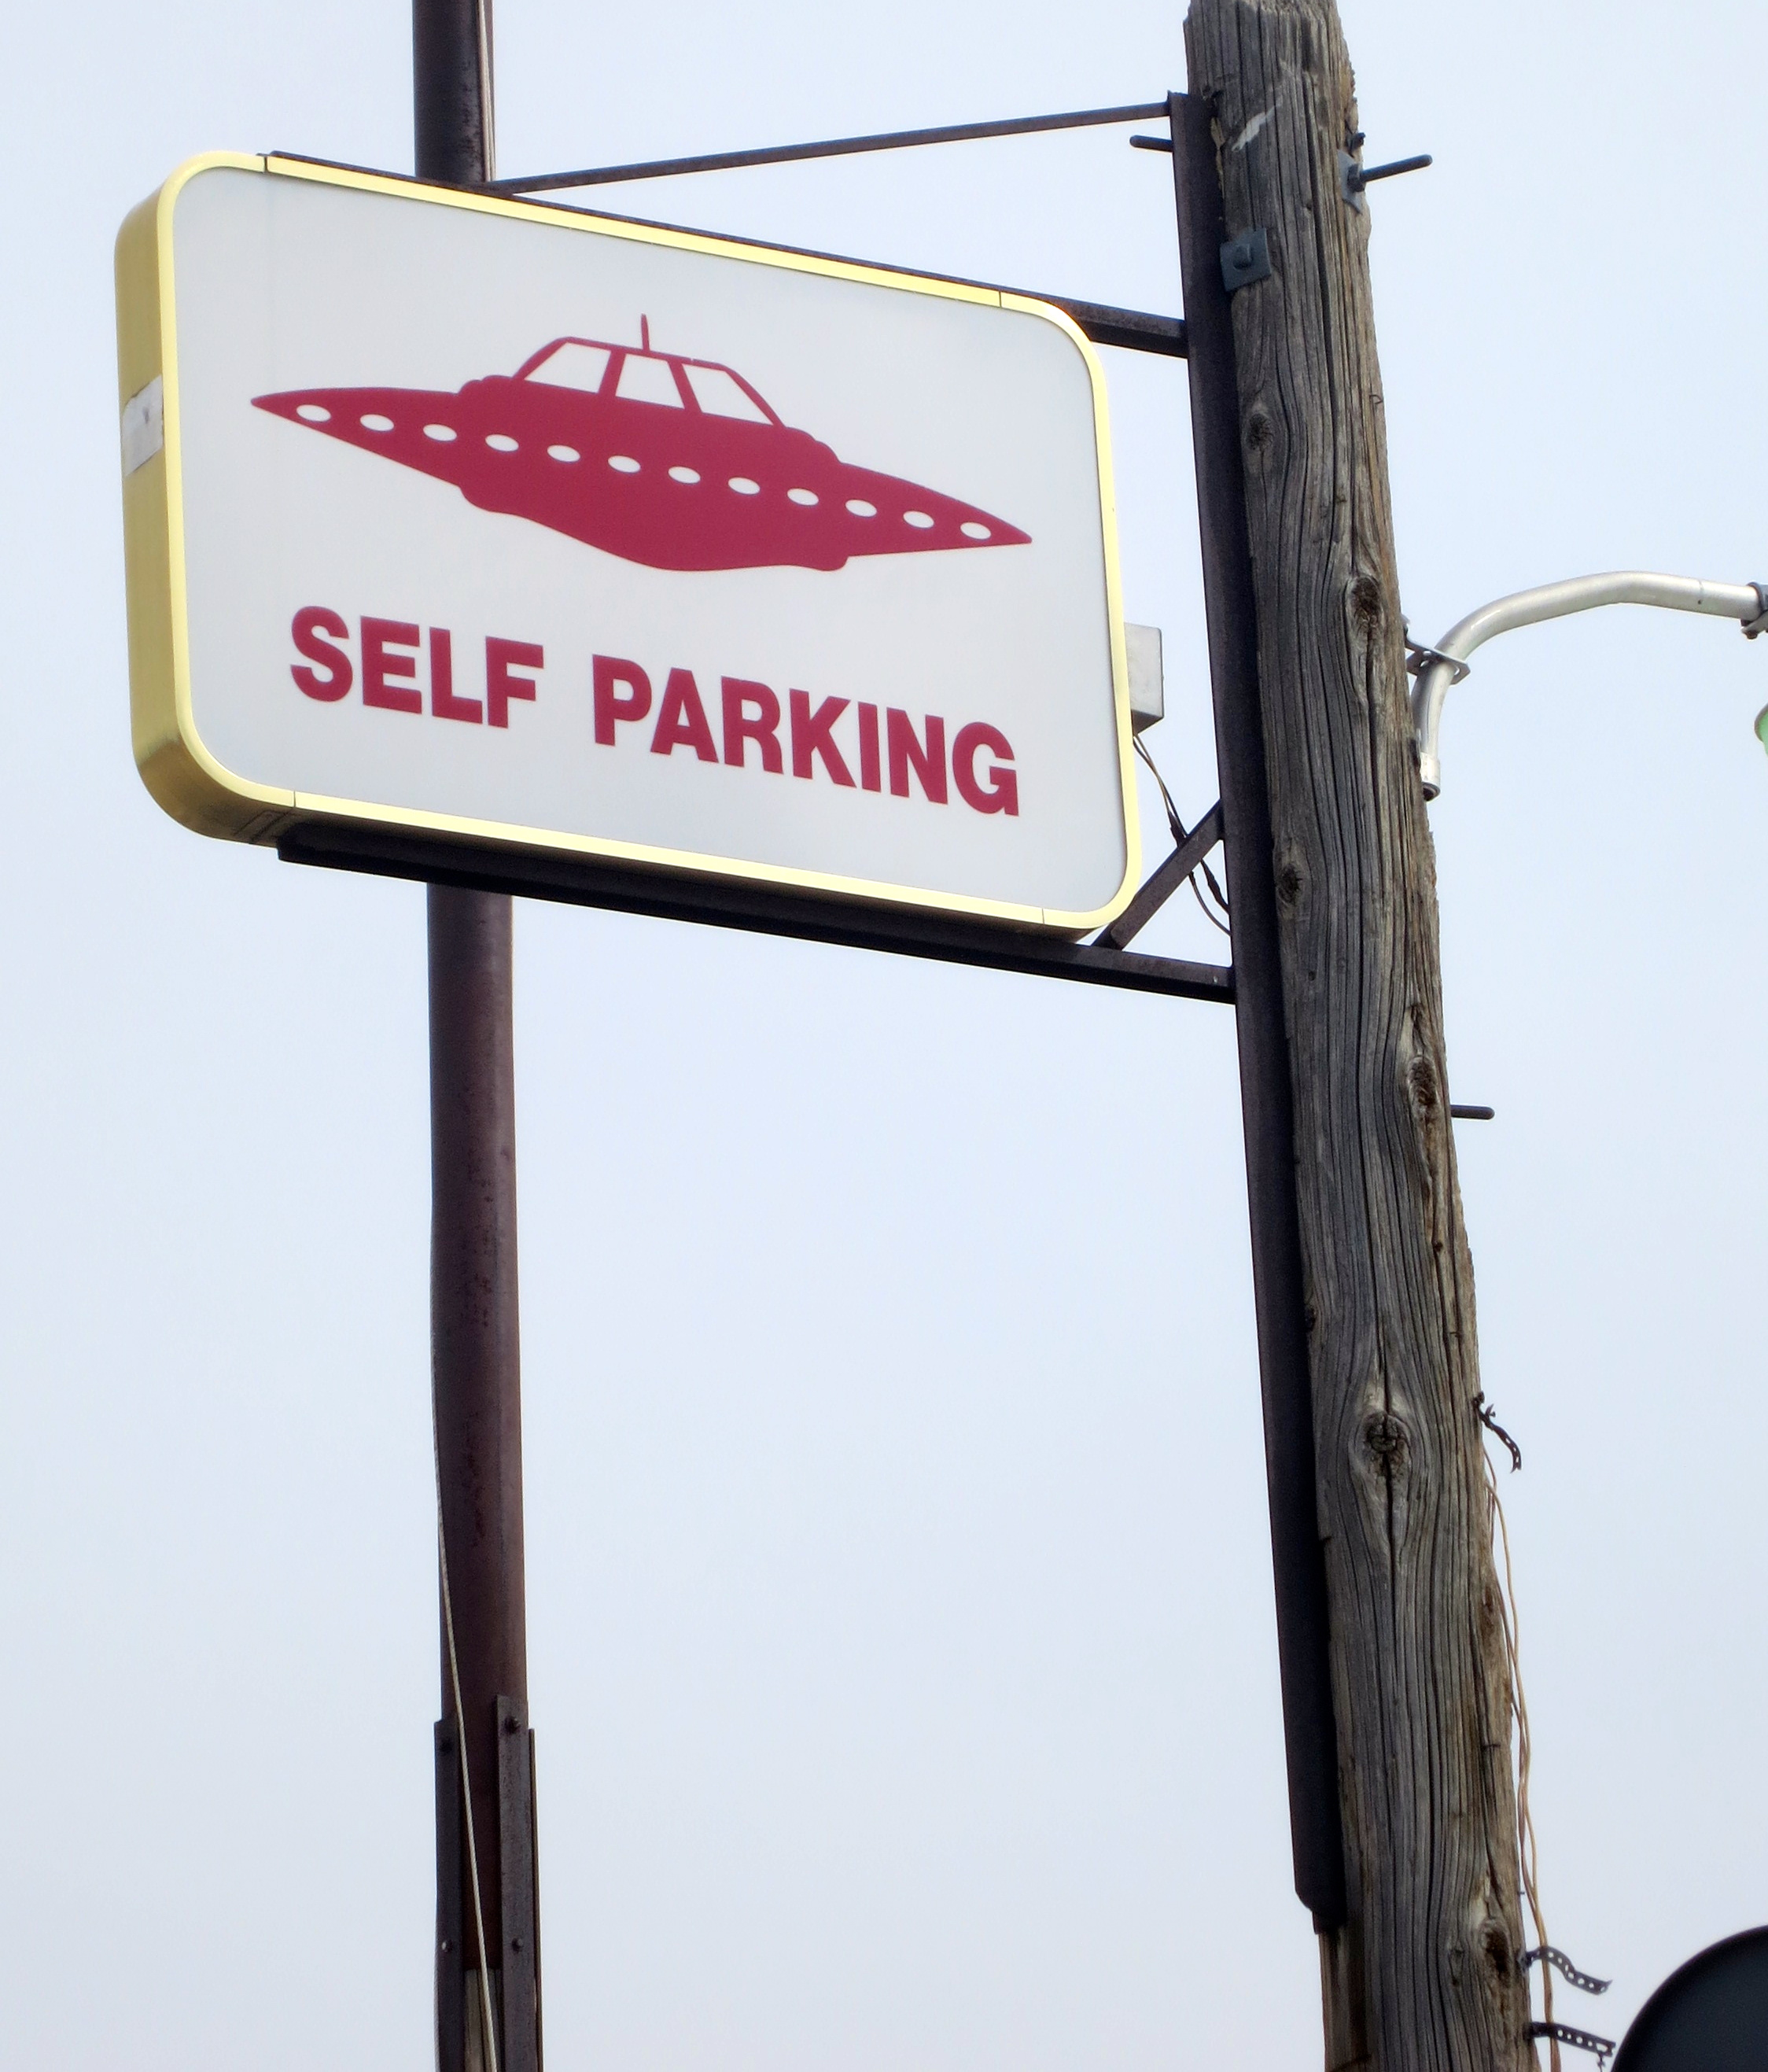 Self parking sign at the Little A'le'Inn in Rachel, Nevada.